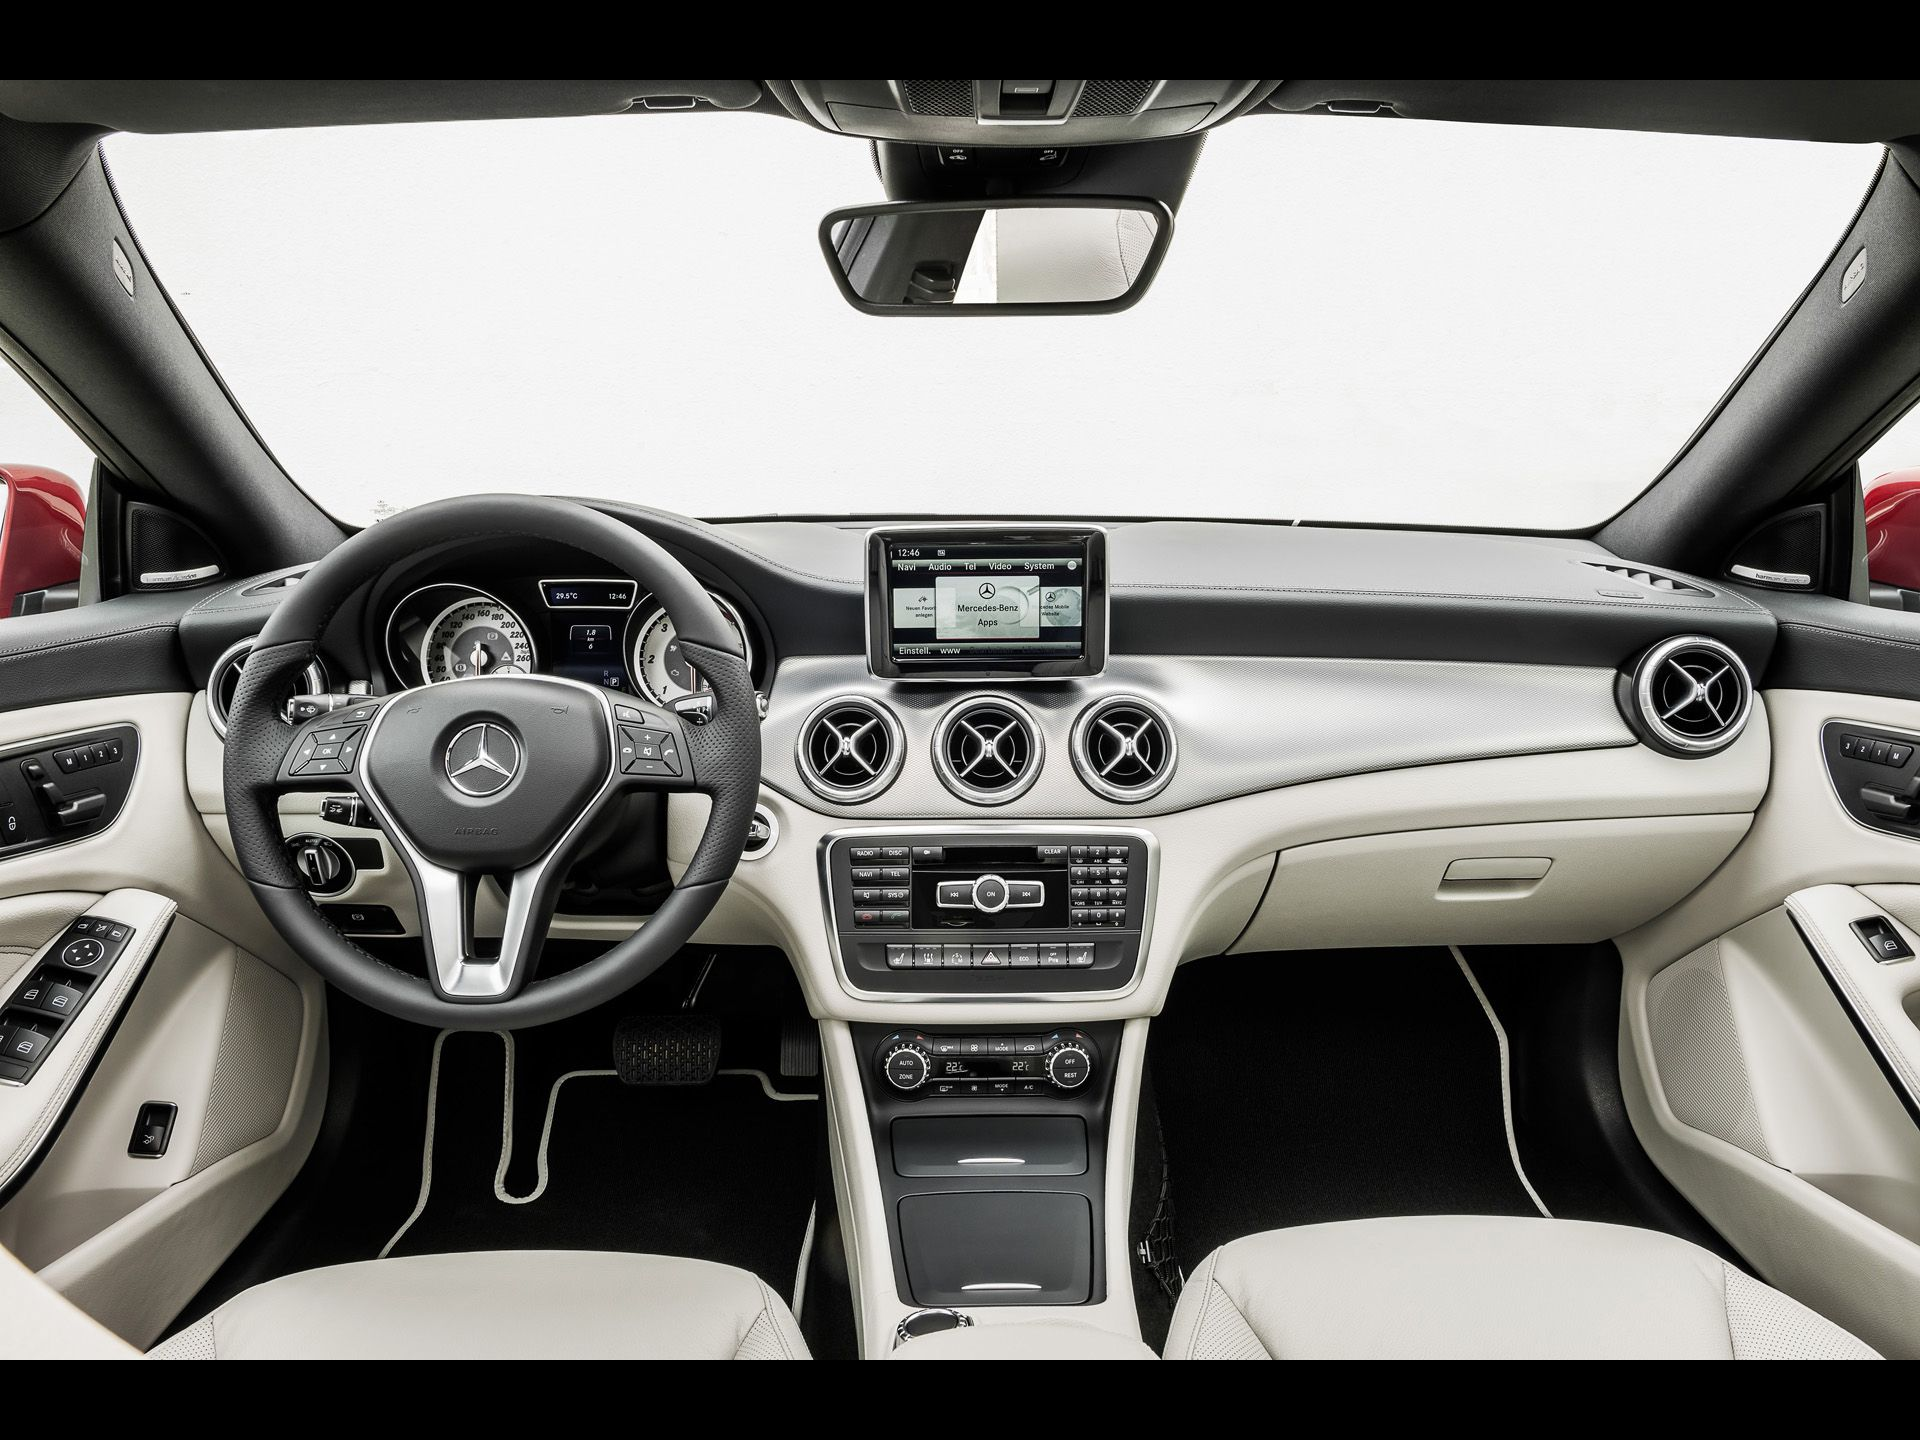 Mercedes Benz Cla 2013 Interior 2013 Mercedes Benz Cla Class